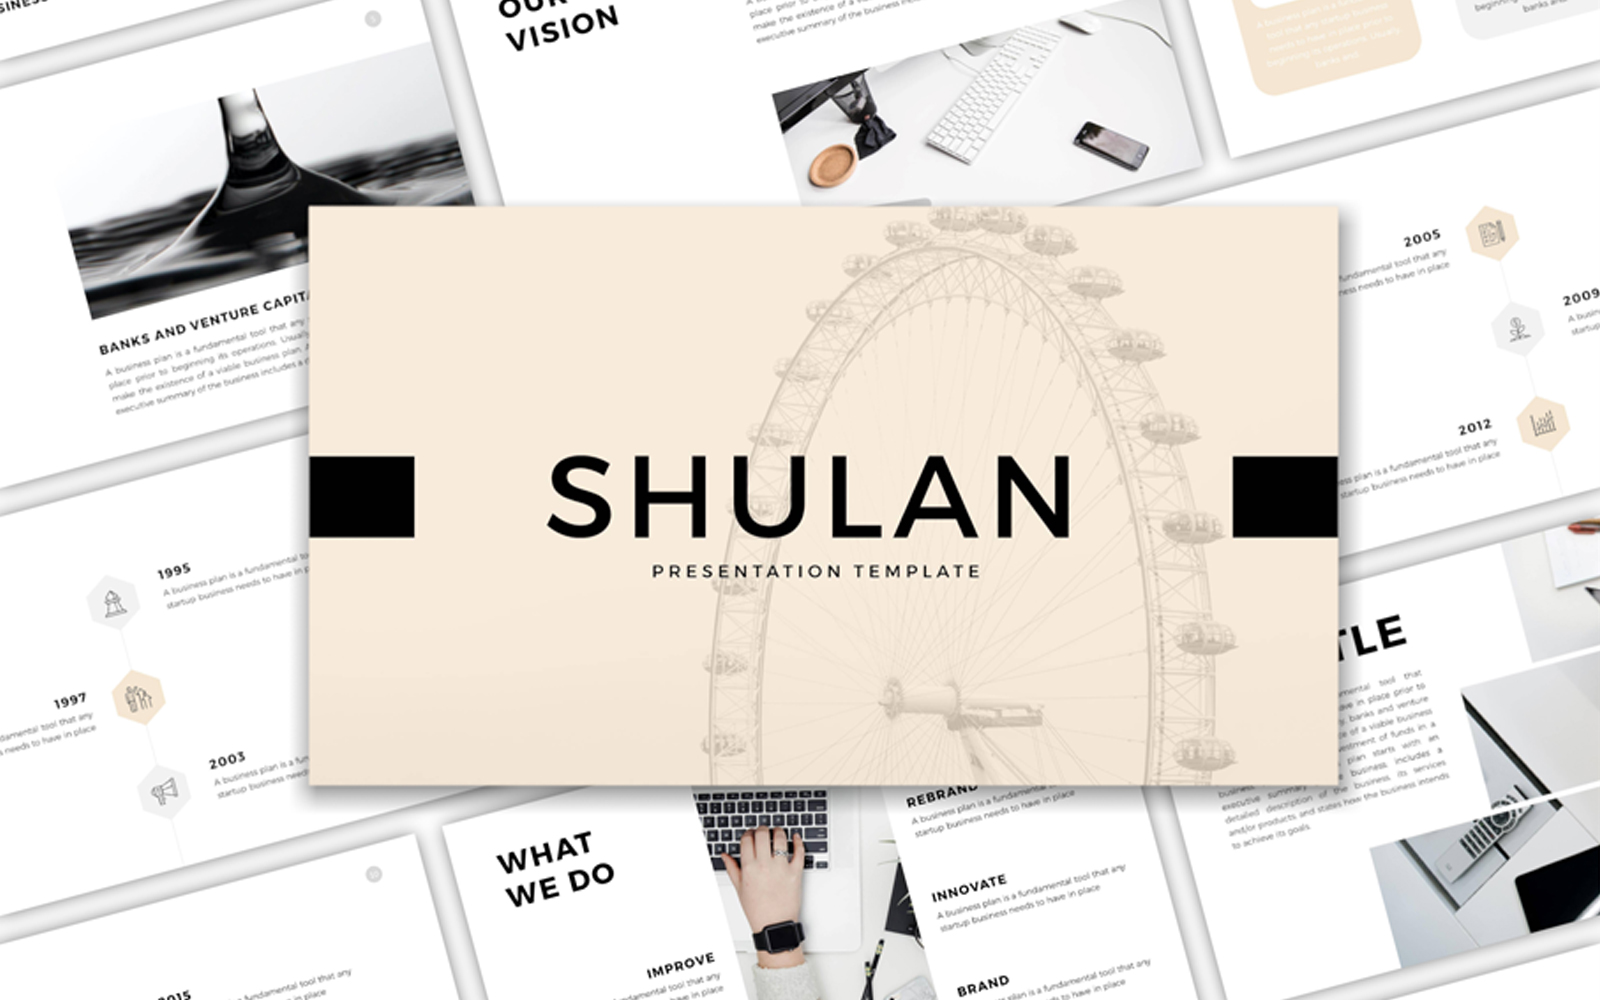 Shulan PowerPoint Presentation